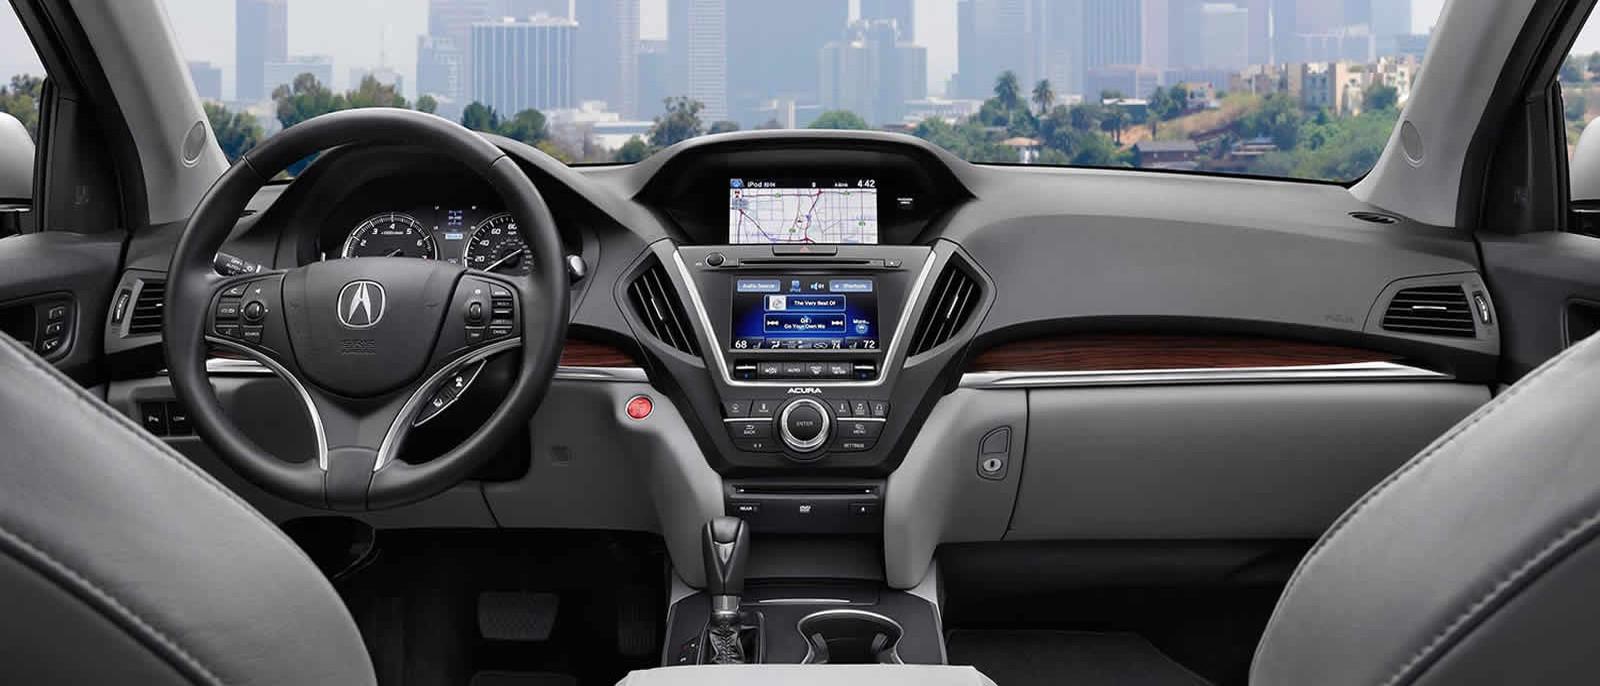 2014 Acura MDX Orland Park Tinley Park | Joe Rizza Acura